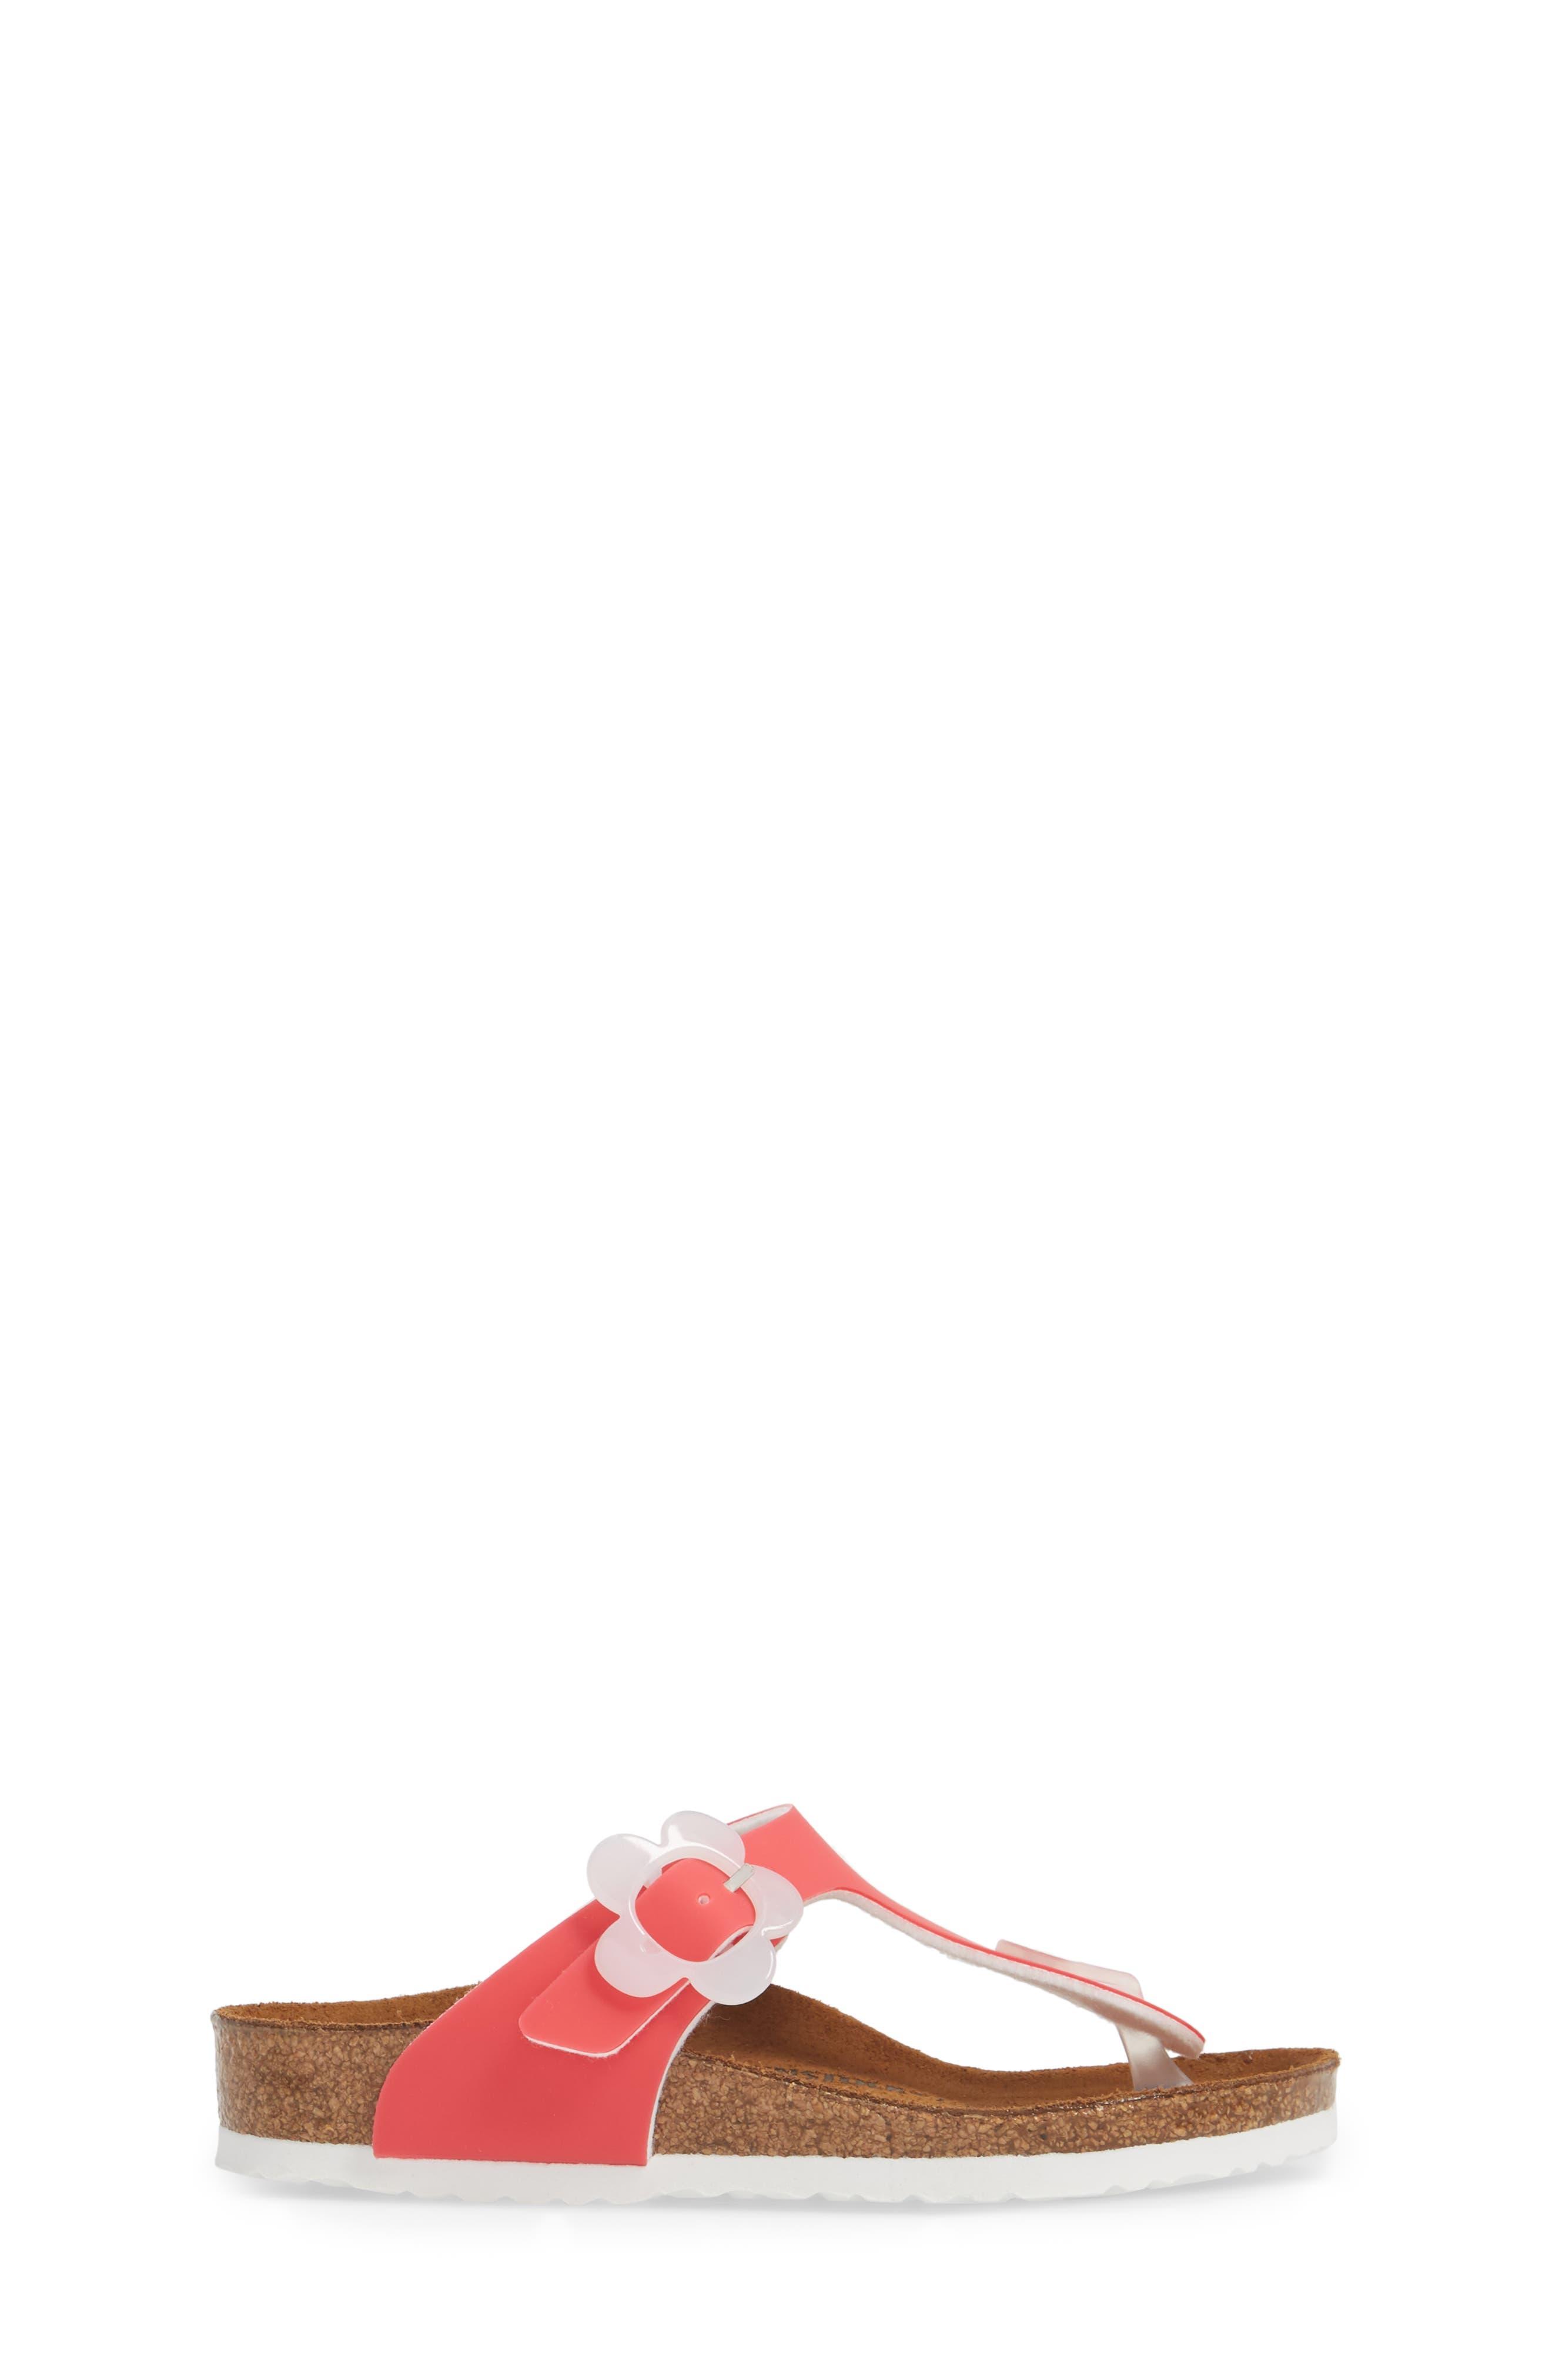 Gizeh Flowered Thong Sandal,                             Alternate thumbnail 3, color,                             650